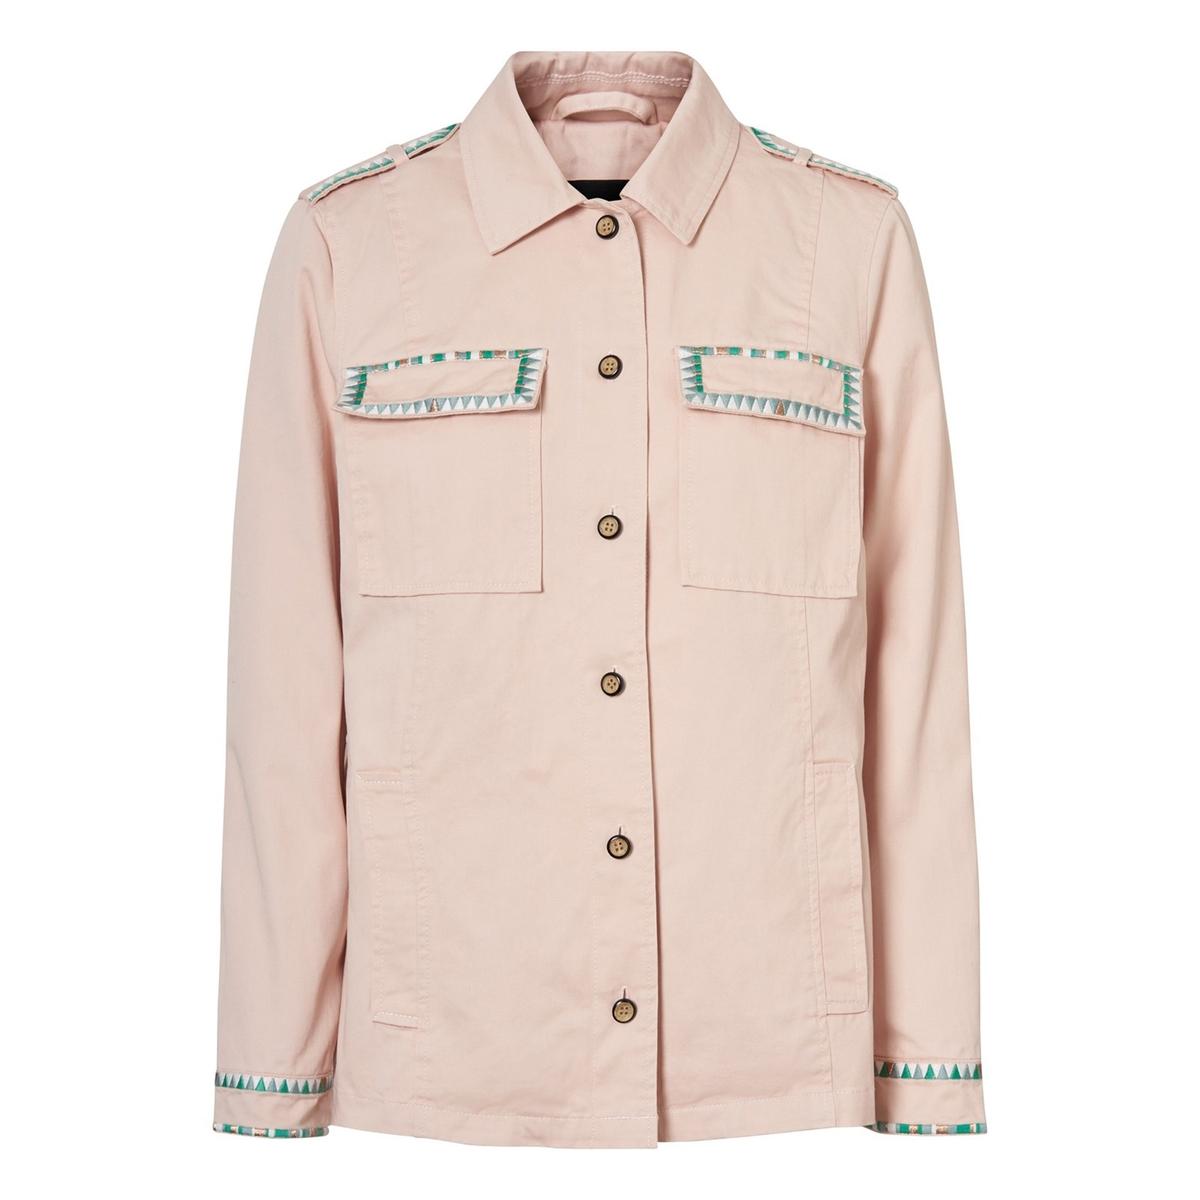 цена Жакет-рубашка La Redoute Прямого покроя M розовый онлайн в 2017 году